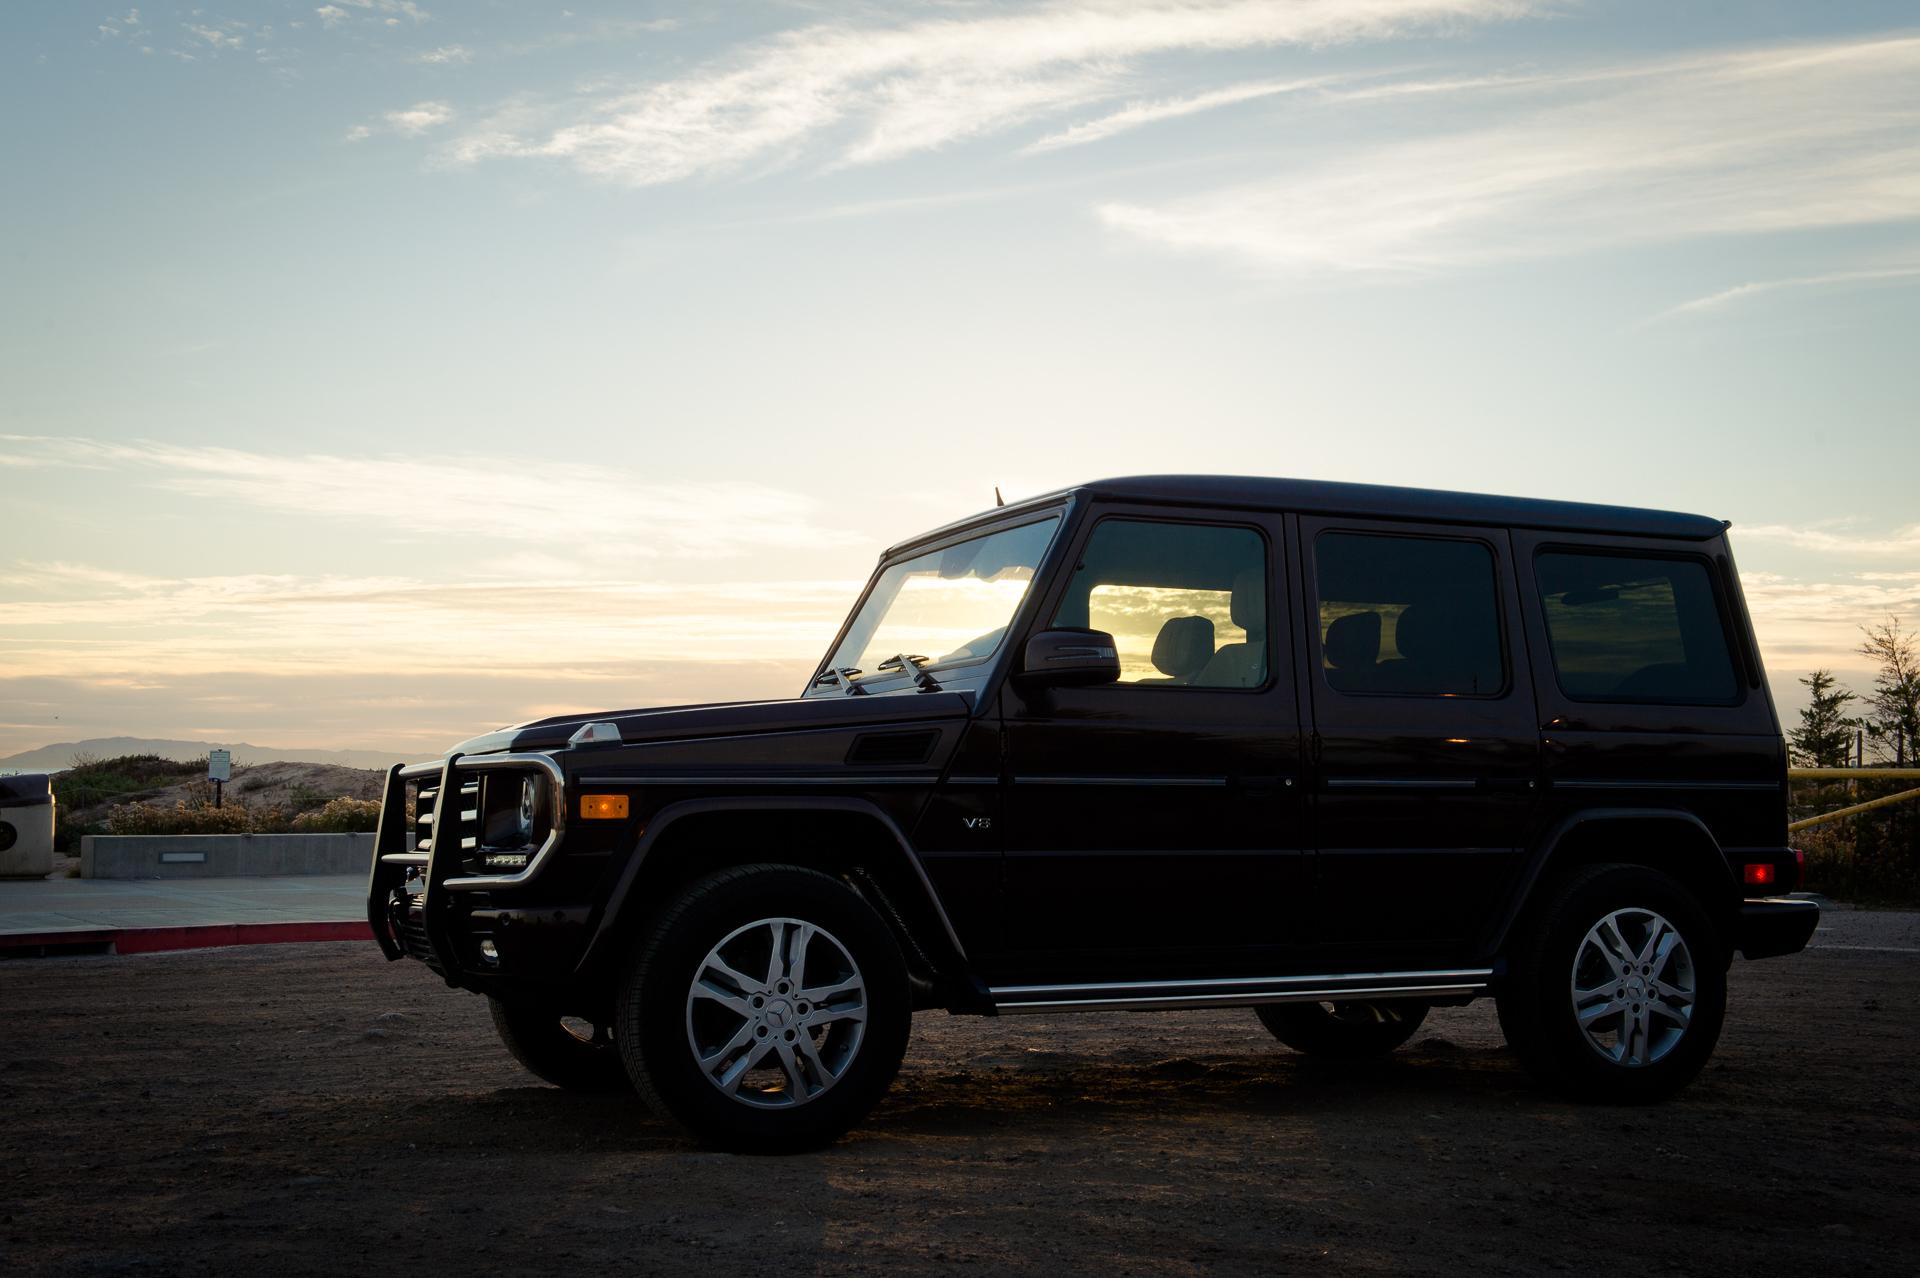 2014-Mercedes-Benz-G500-G550-braun-Kalifornien-mbrt14-45